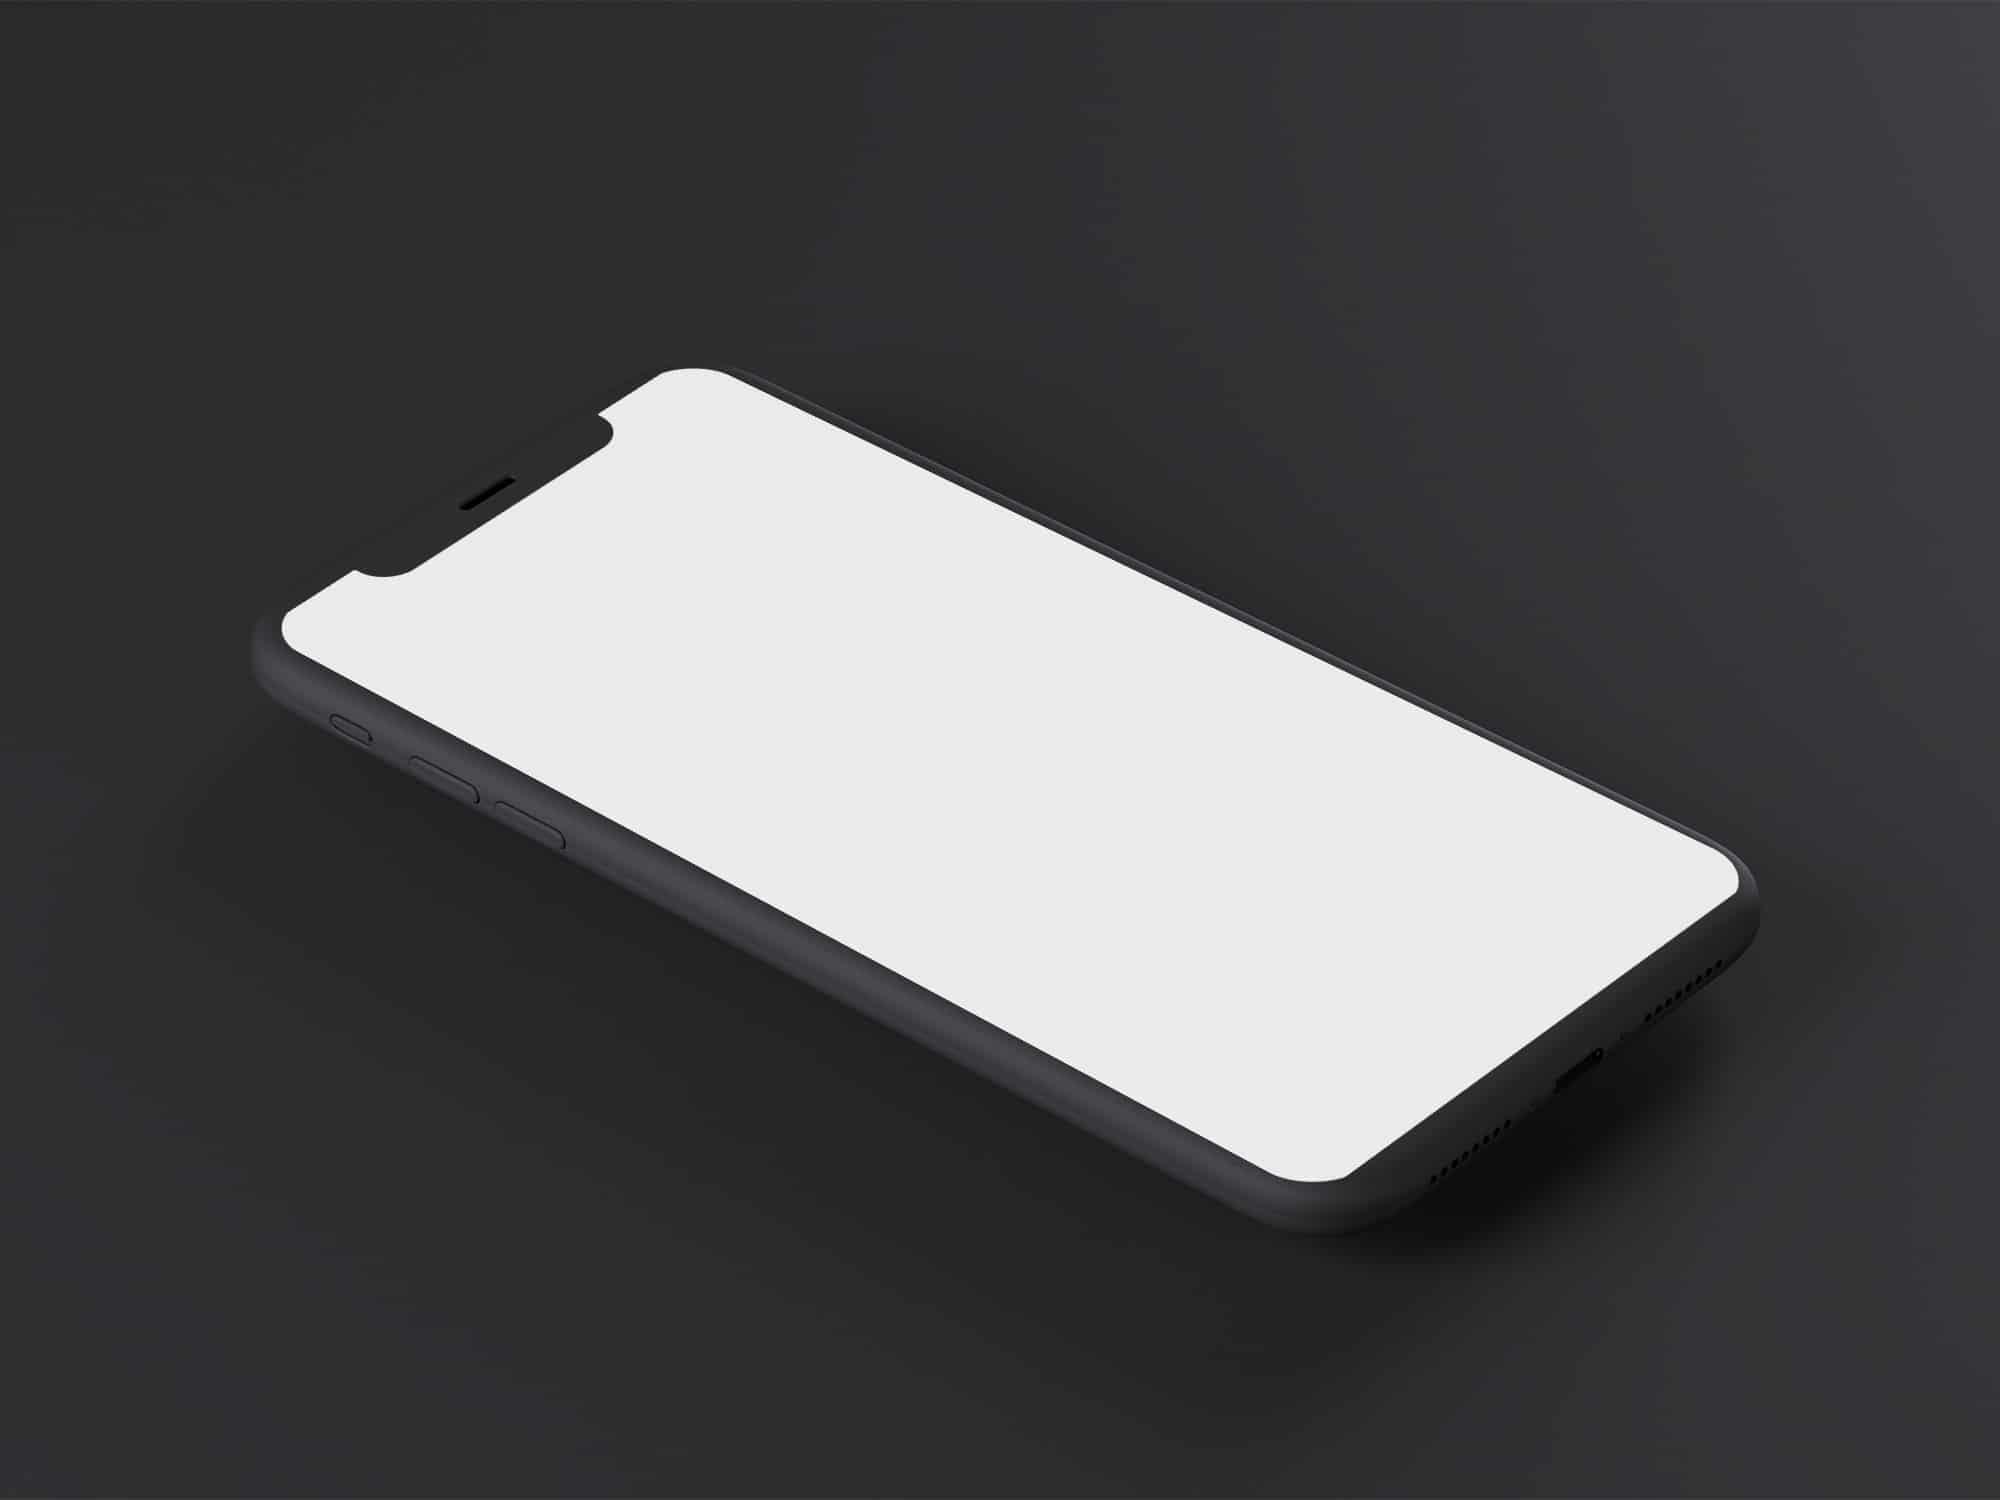 Minimal Dark Iphone X Mockup The Mockup Club Mockup Iphone Minimalism